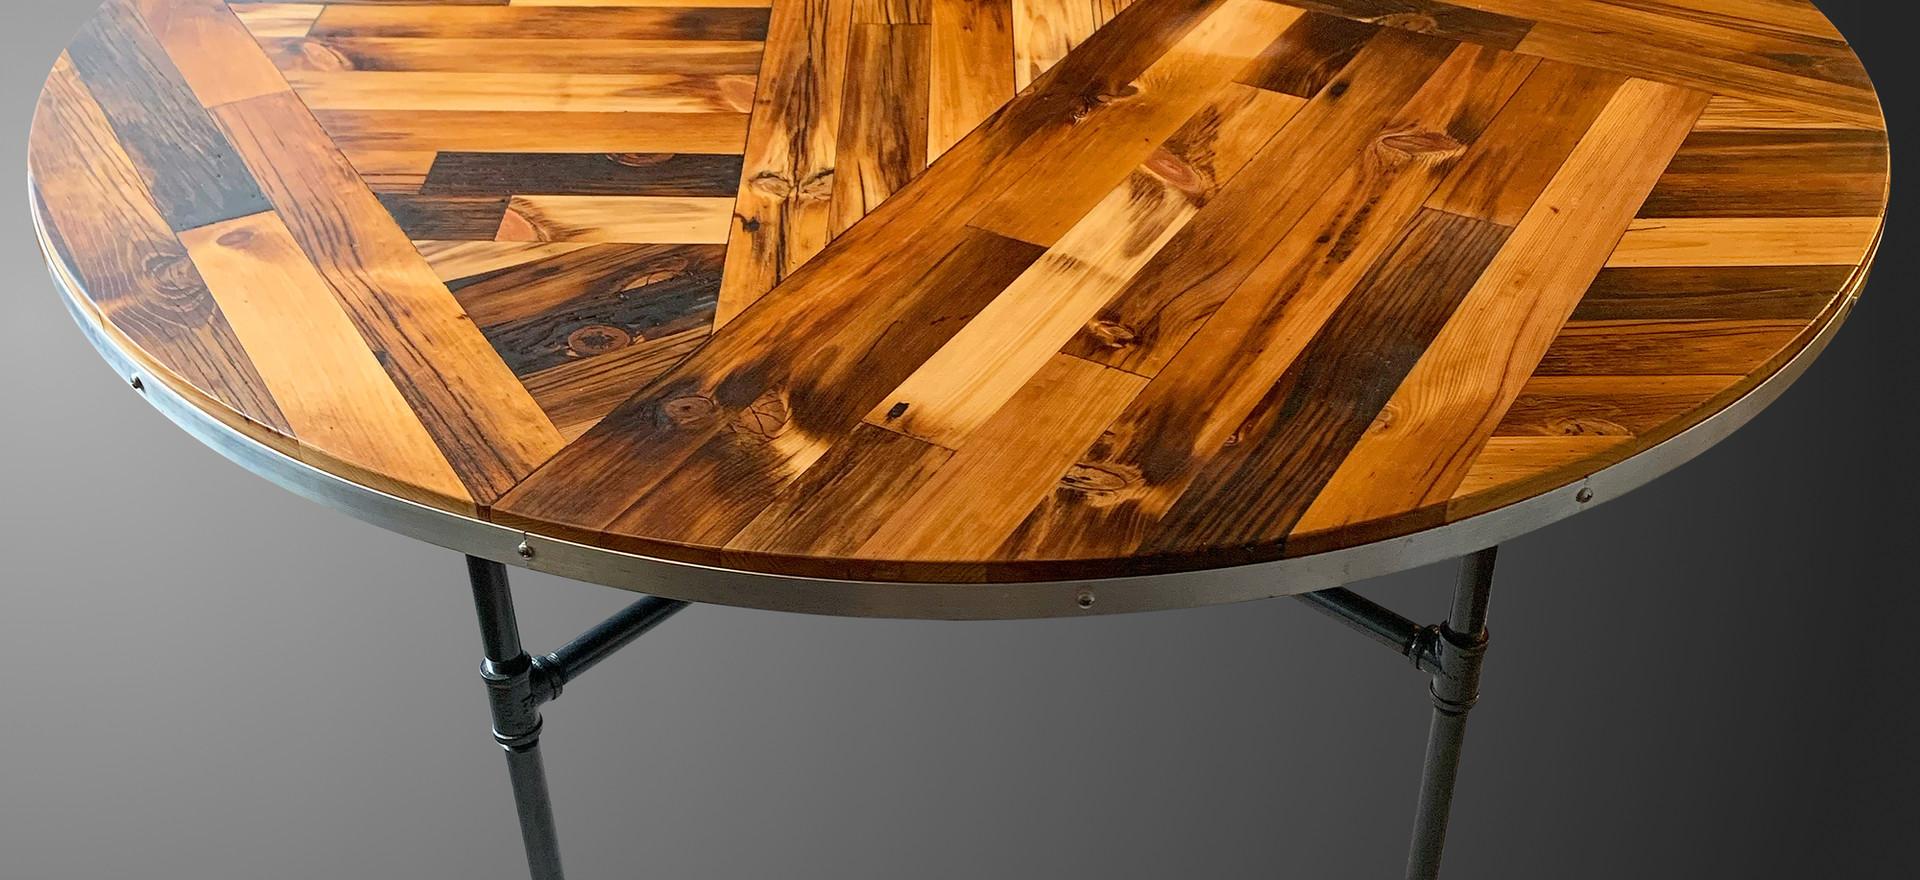 Round Scissor Tail Table